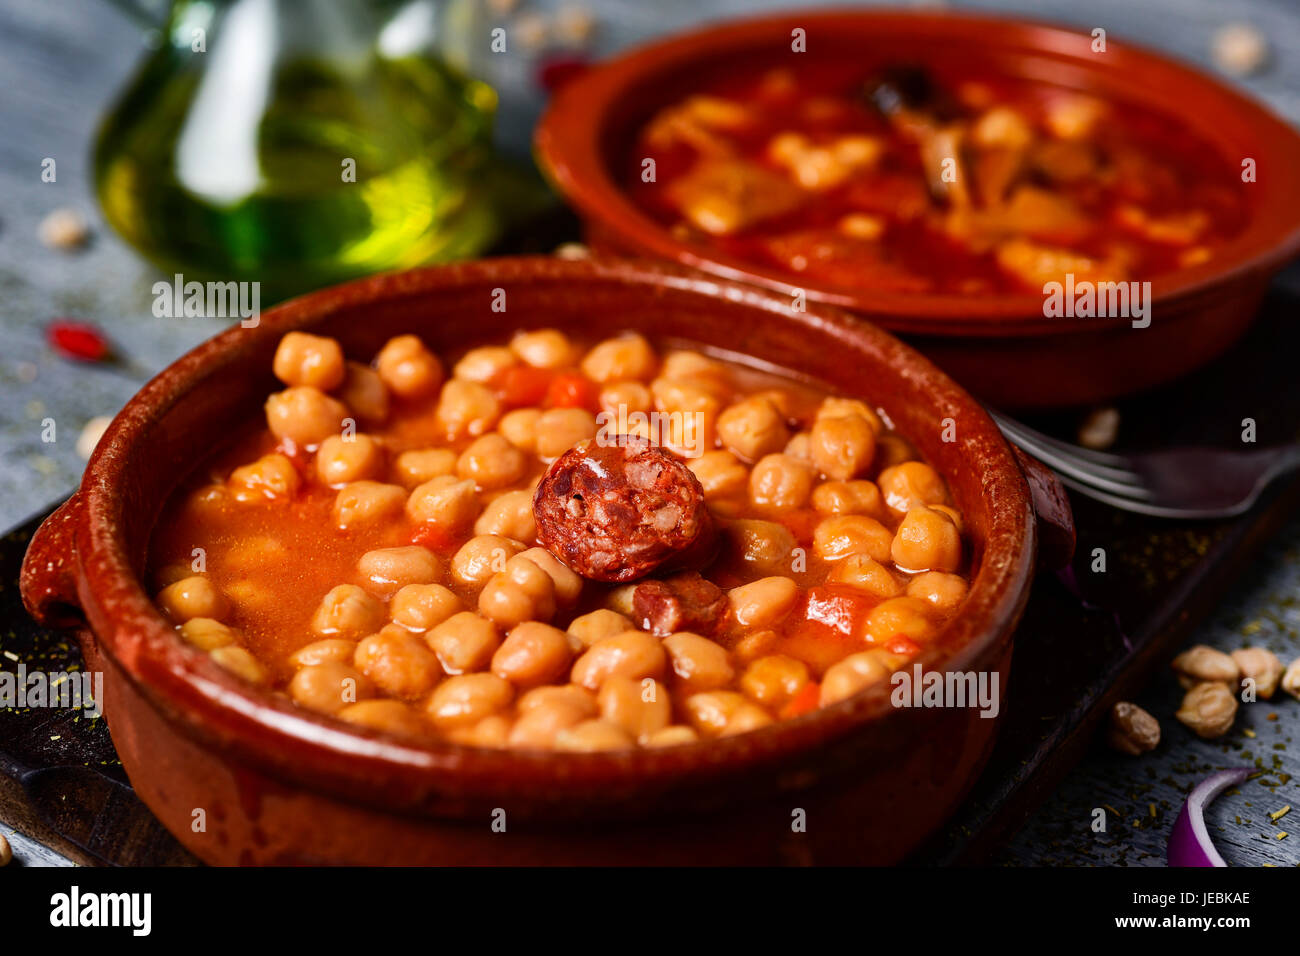 closeup of an earthenware bowl with potaje de garbanzos, a chickpeas stew with chorizo and serrano ham, and a bowl - Stock Image